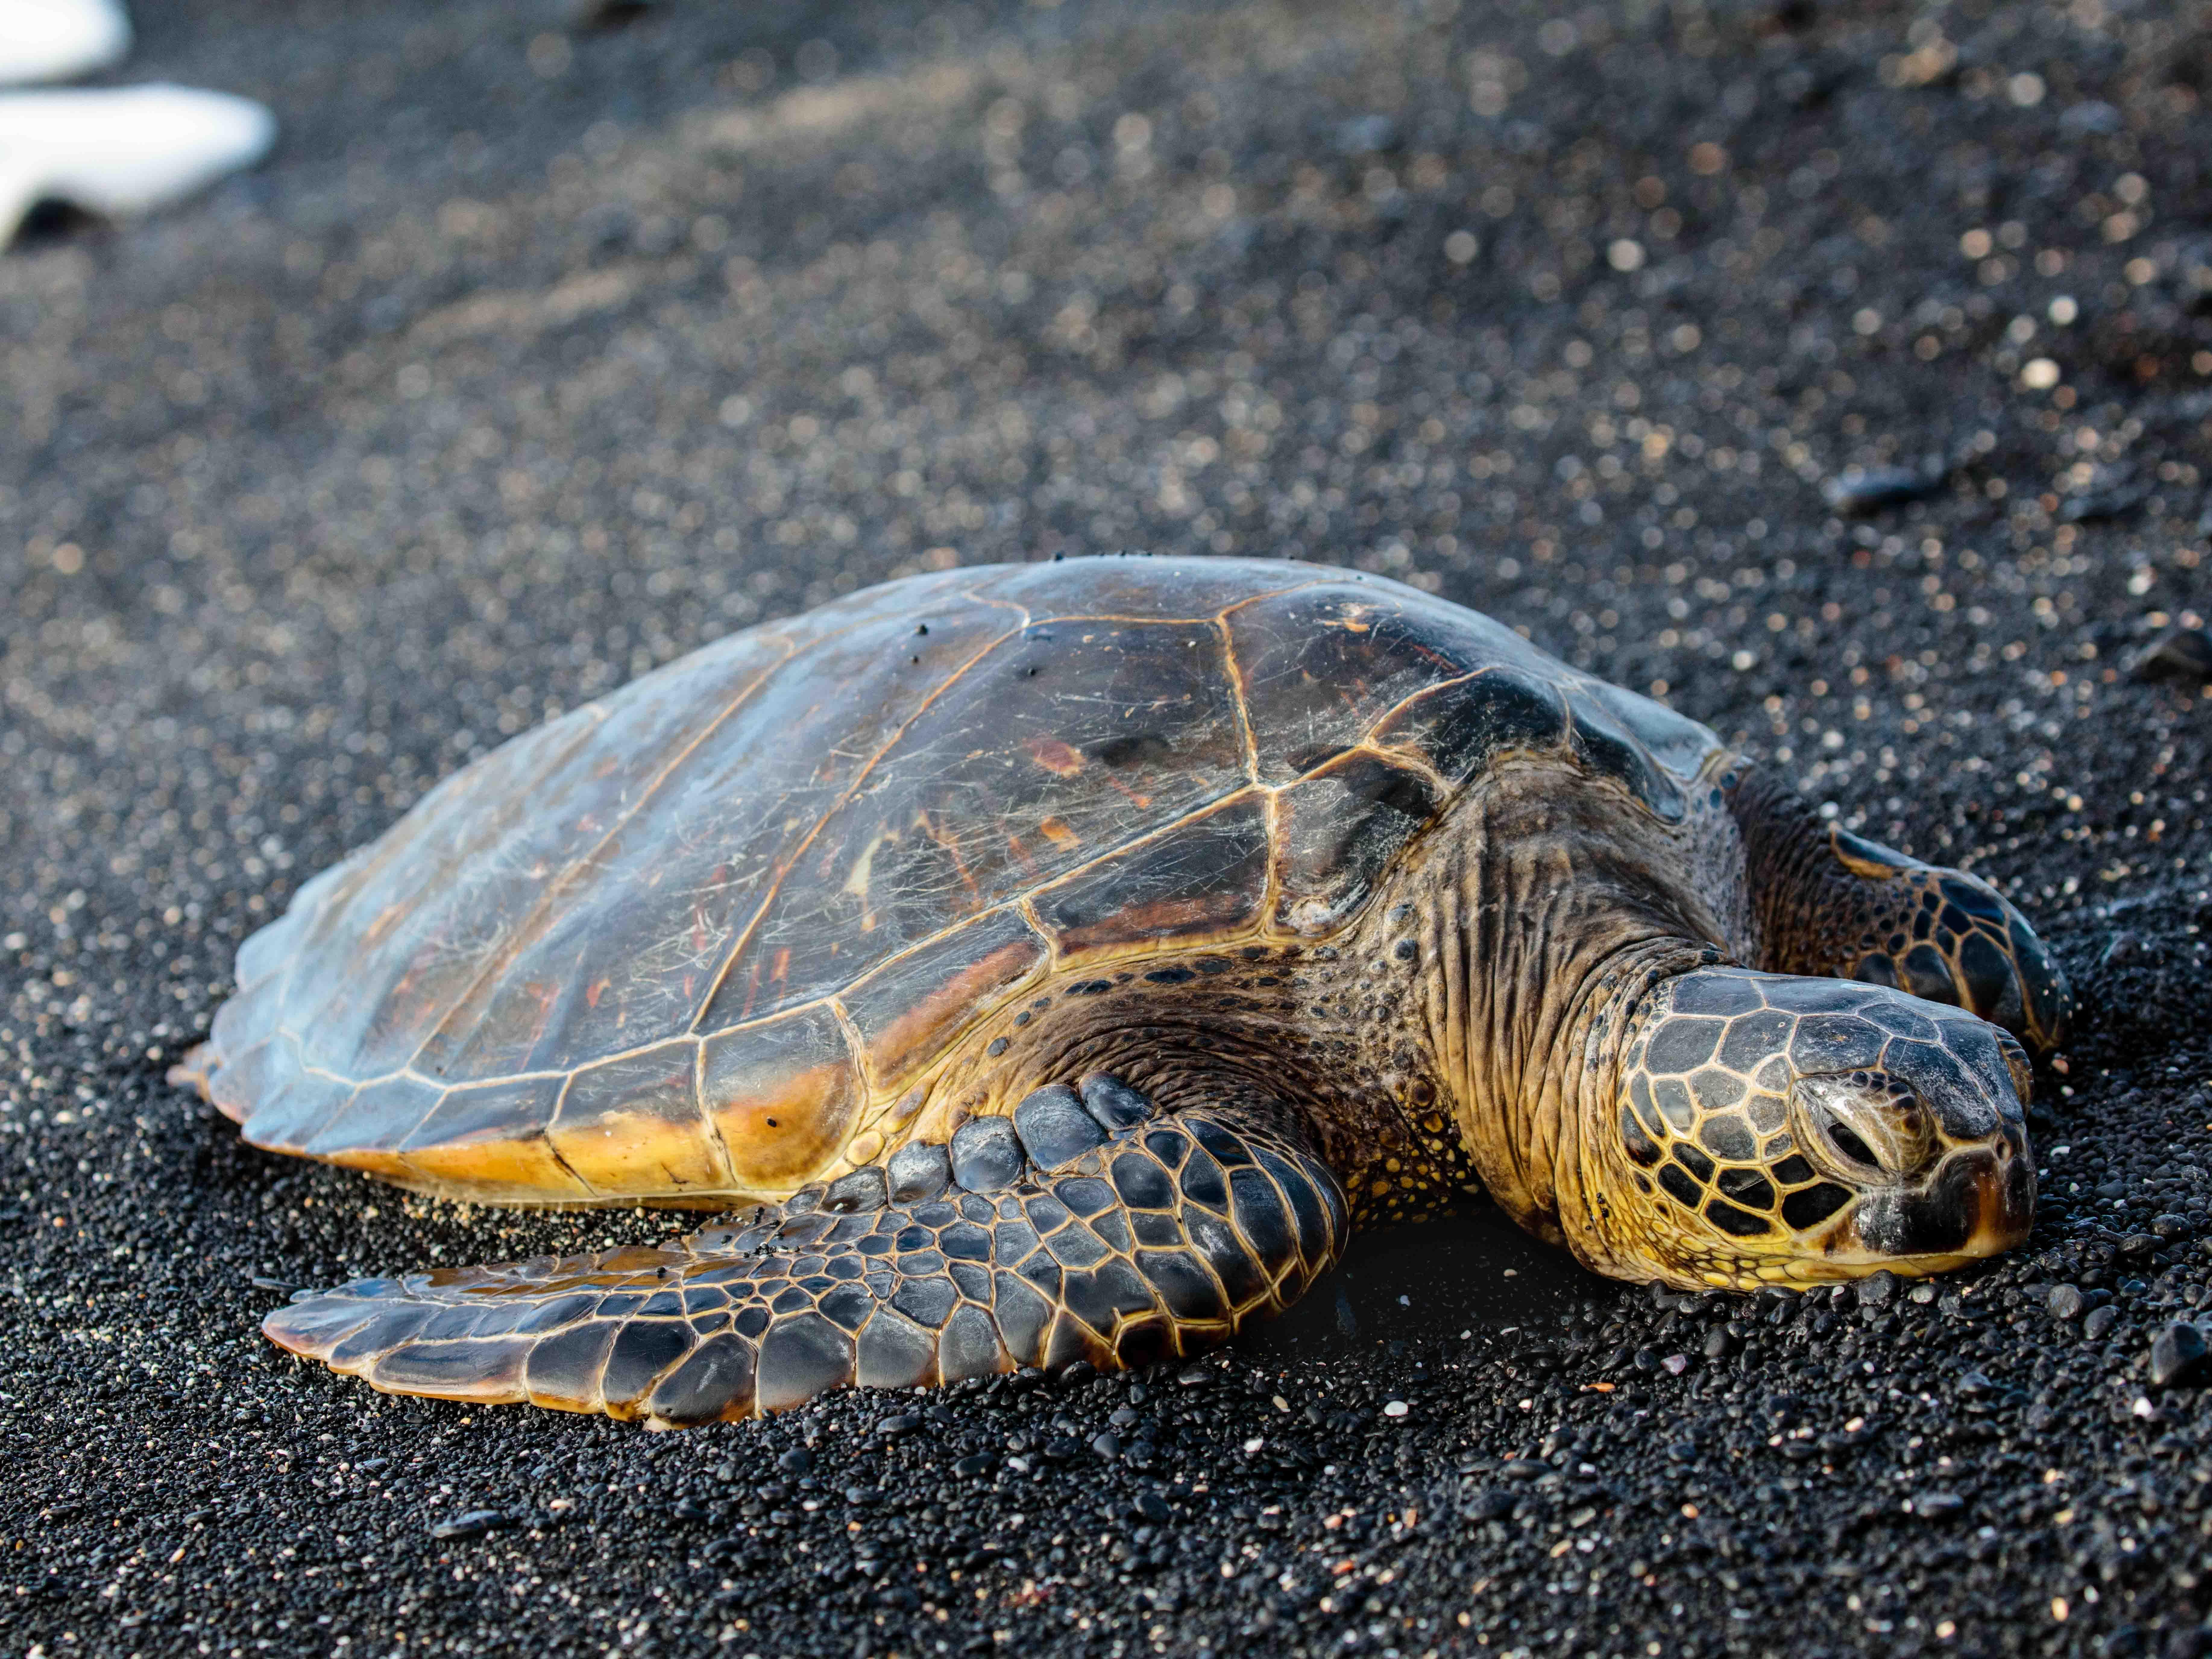 Marriott's Waikoloa Ocean Club Big Turtle, Black Sand. Marriott's Waikoloa Ocean Club is located in Waikoloa Beach, Big Island, Hawai'i United States.